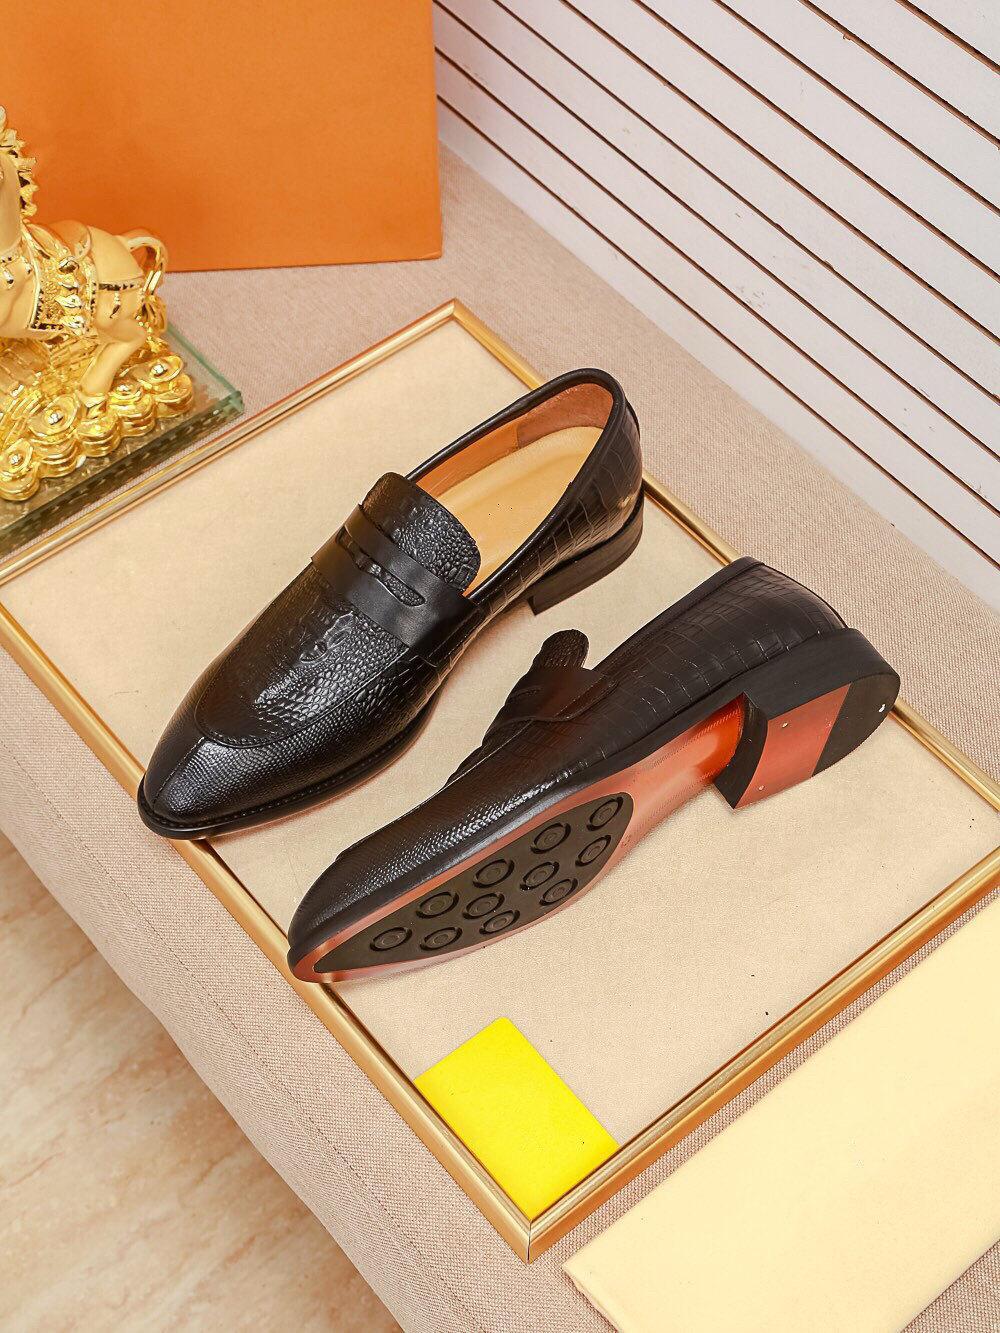 2020 Fashion Designer Dress Dress Shoes Brand Pelle punta in pelle punta Outdoor Oxfords Classic Business Shoes Formal Shoes Men Comforteble Zapatos